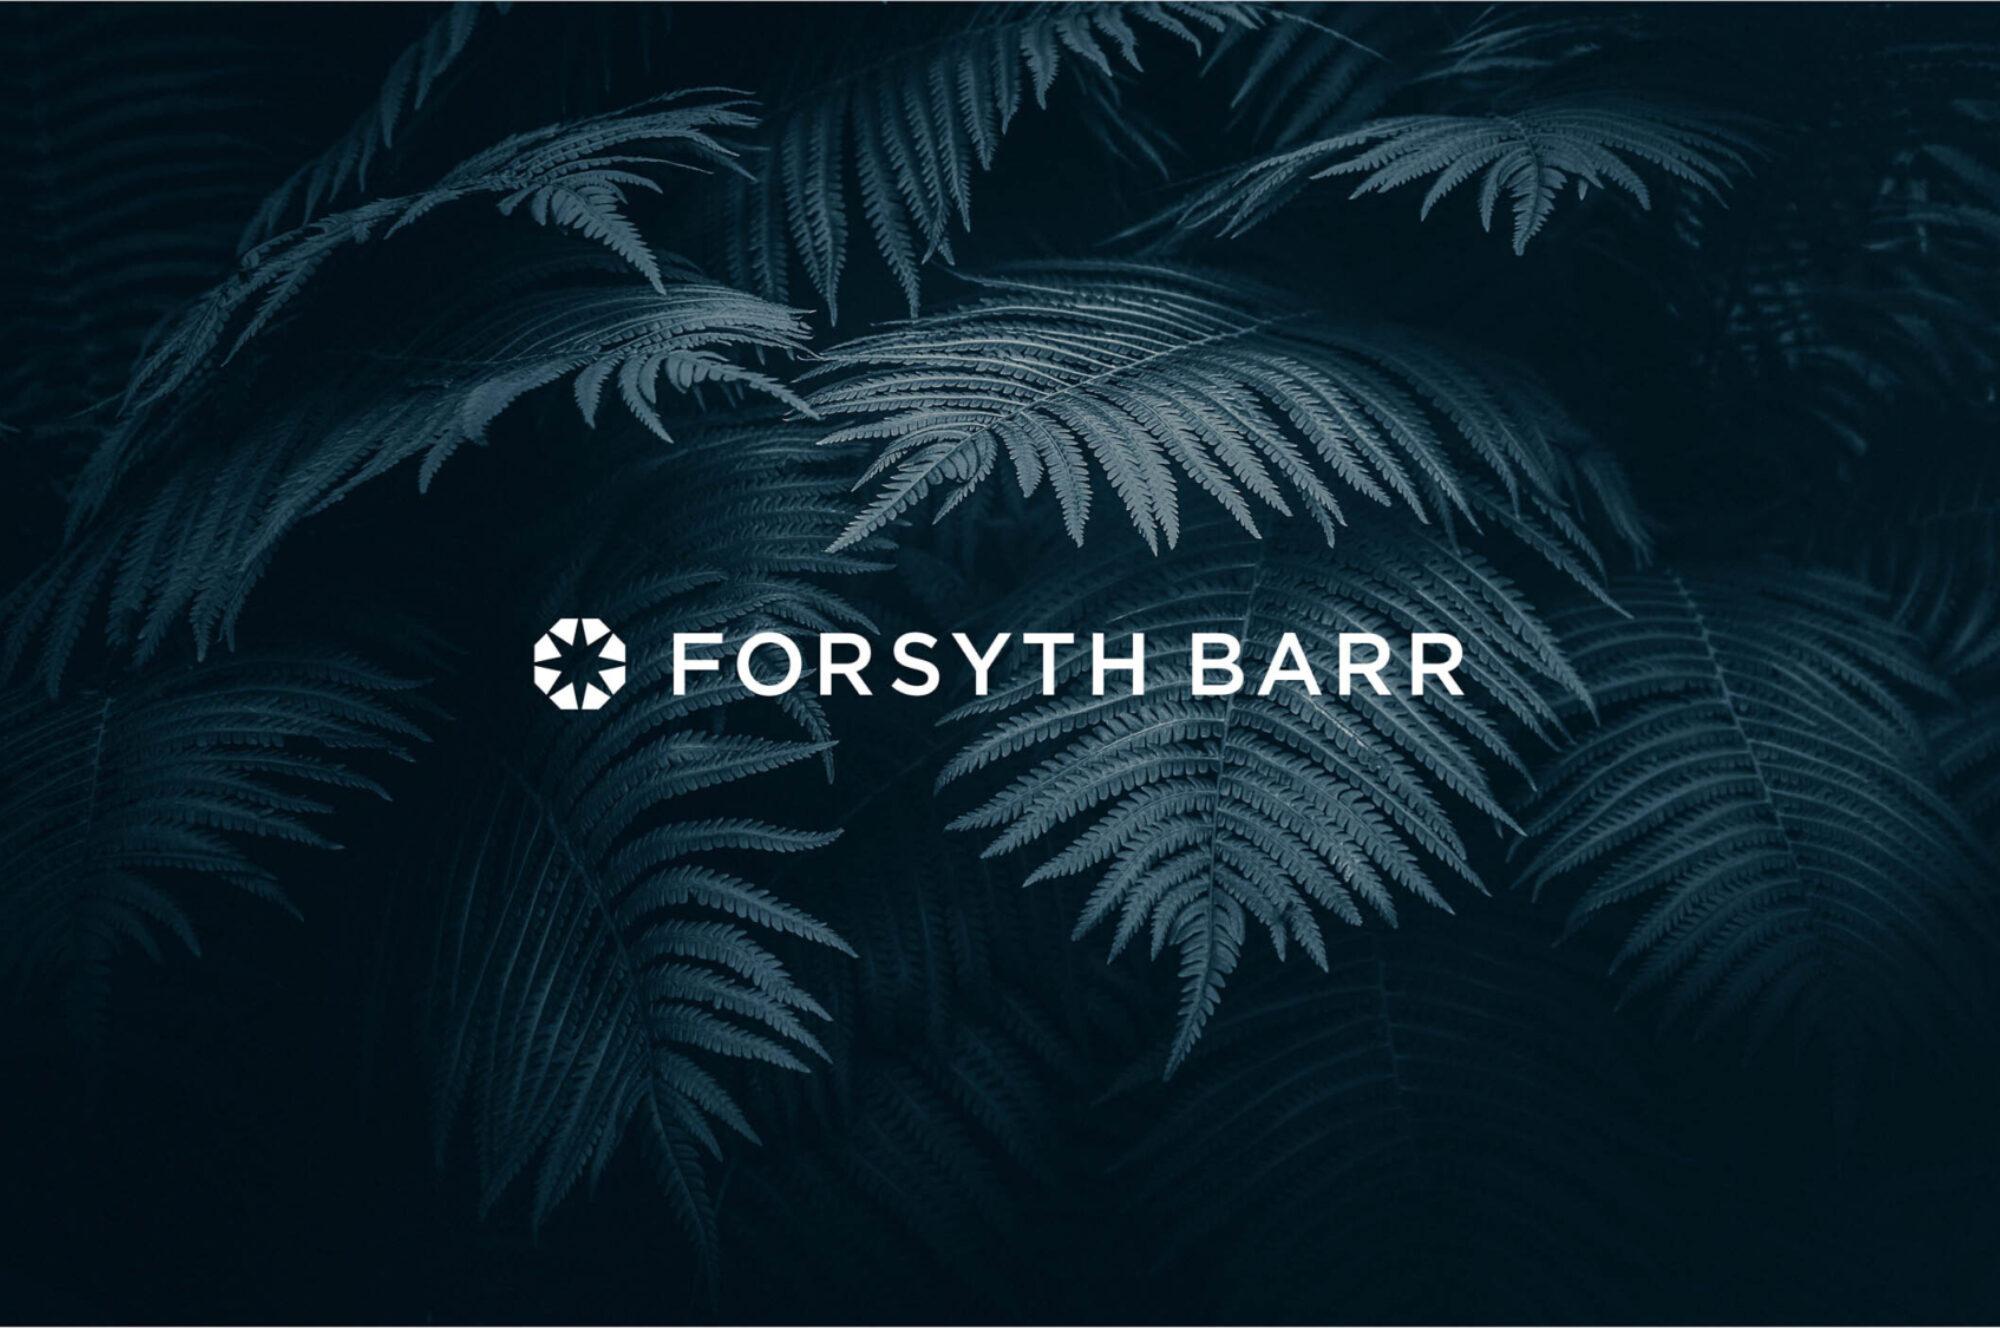 Forsyth Barr digital and brand refresh